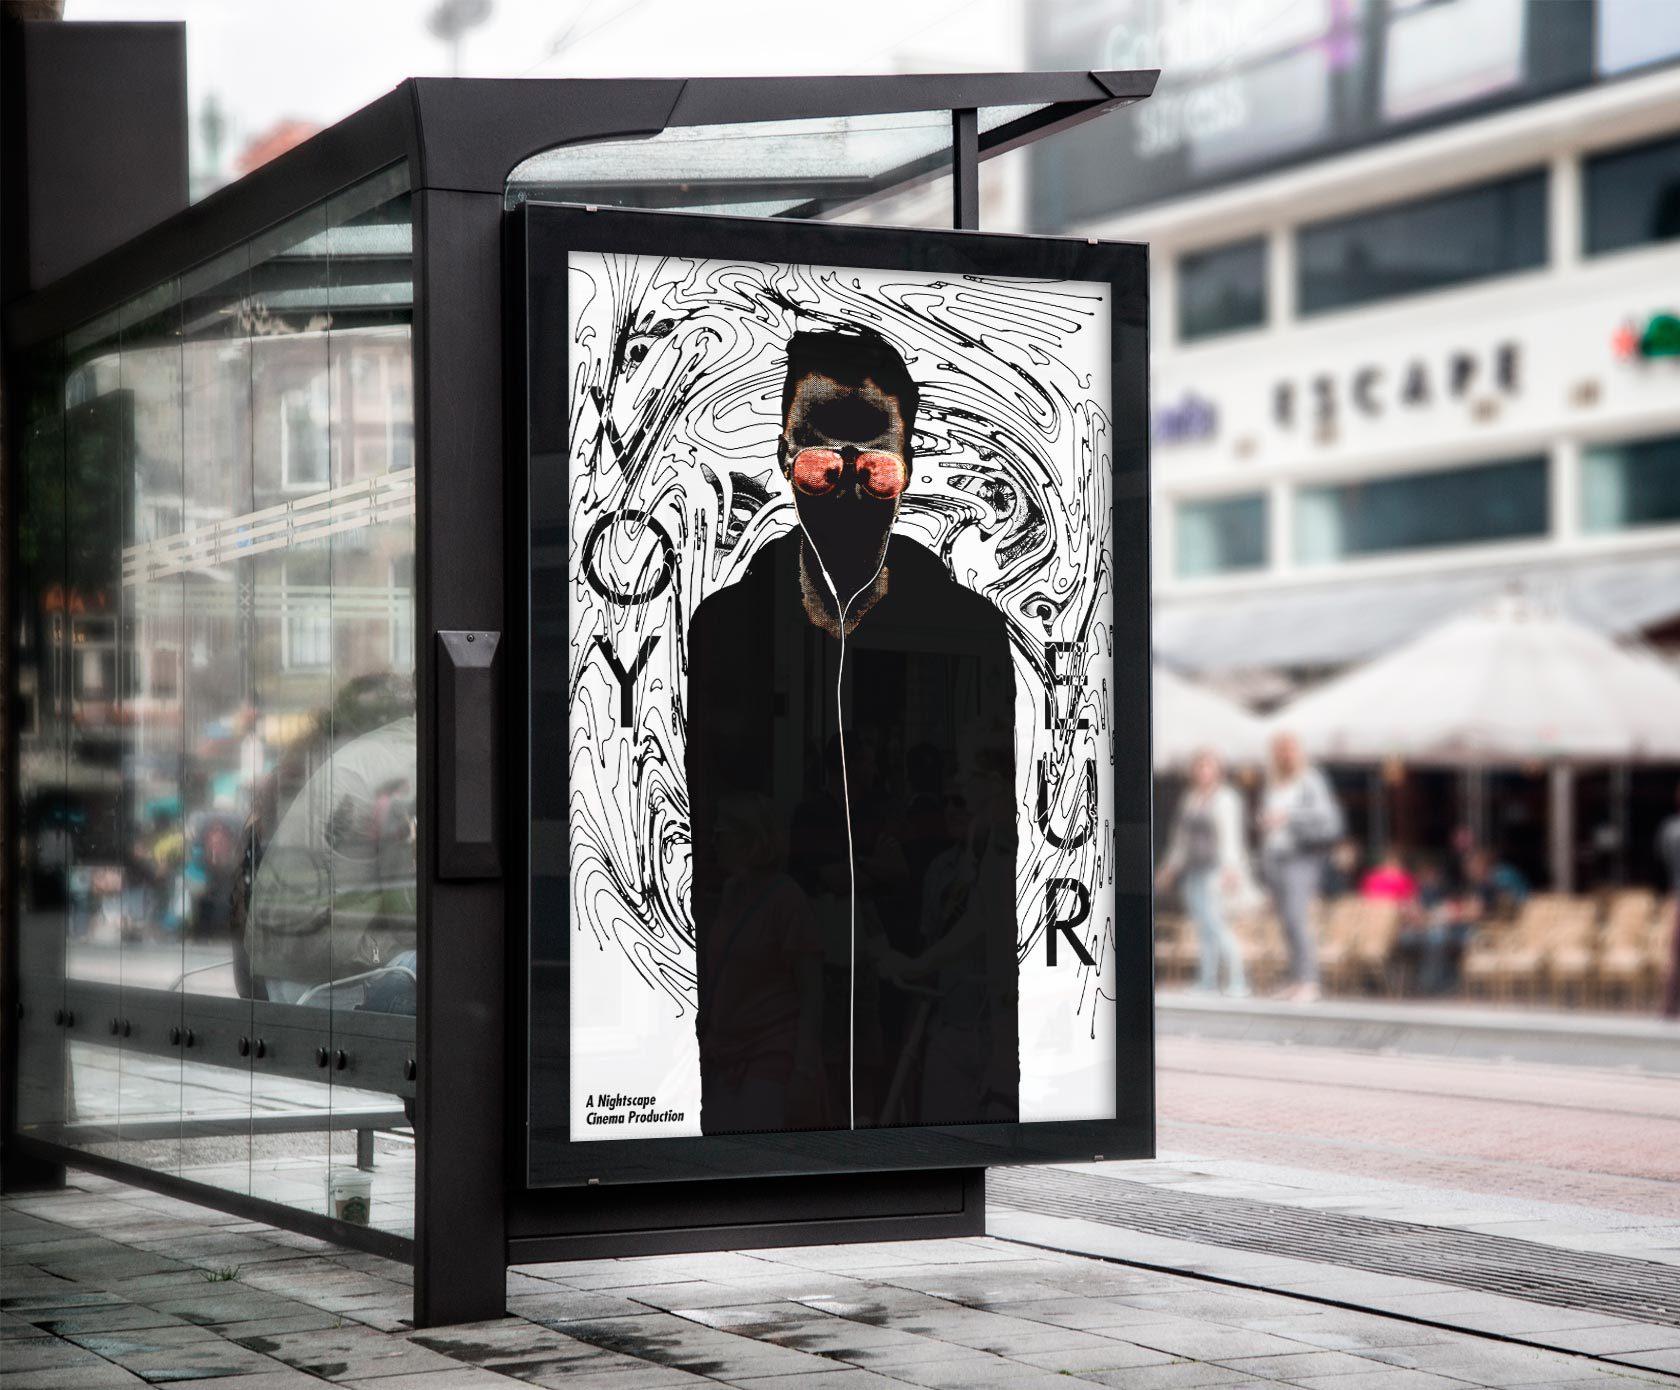 Voyeur Movie Poster Design by Furia